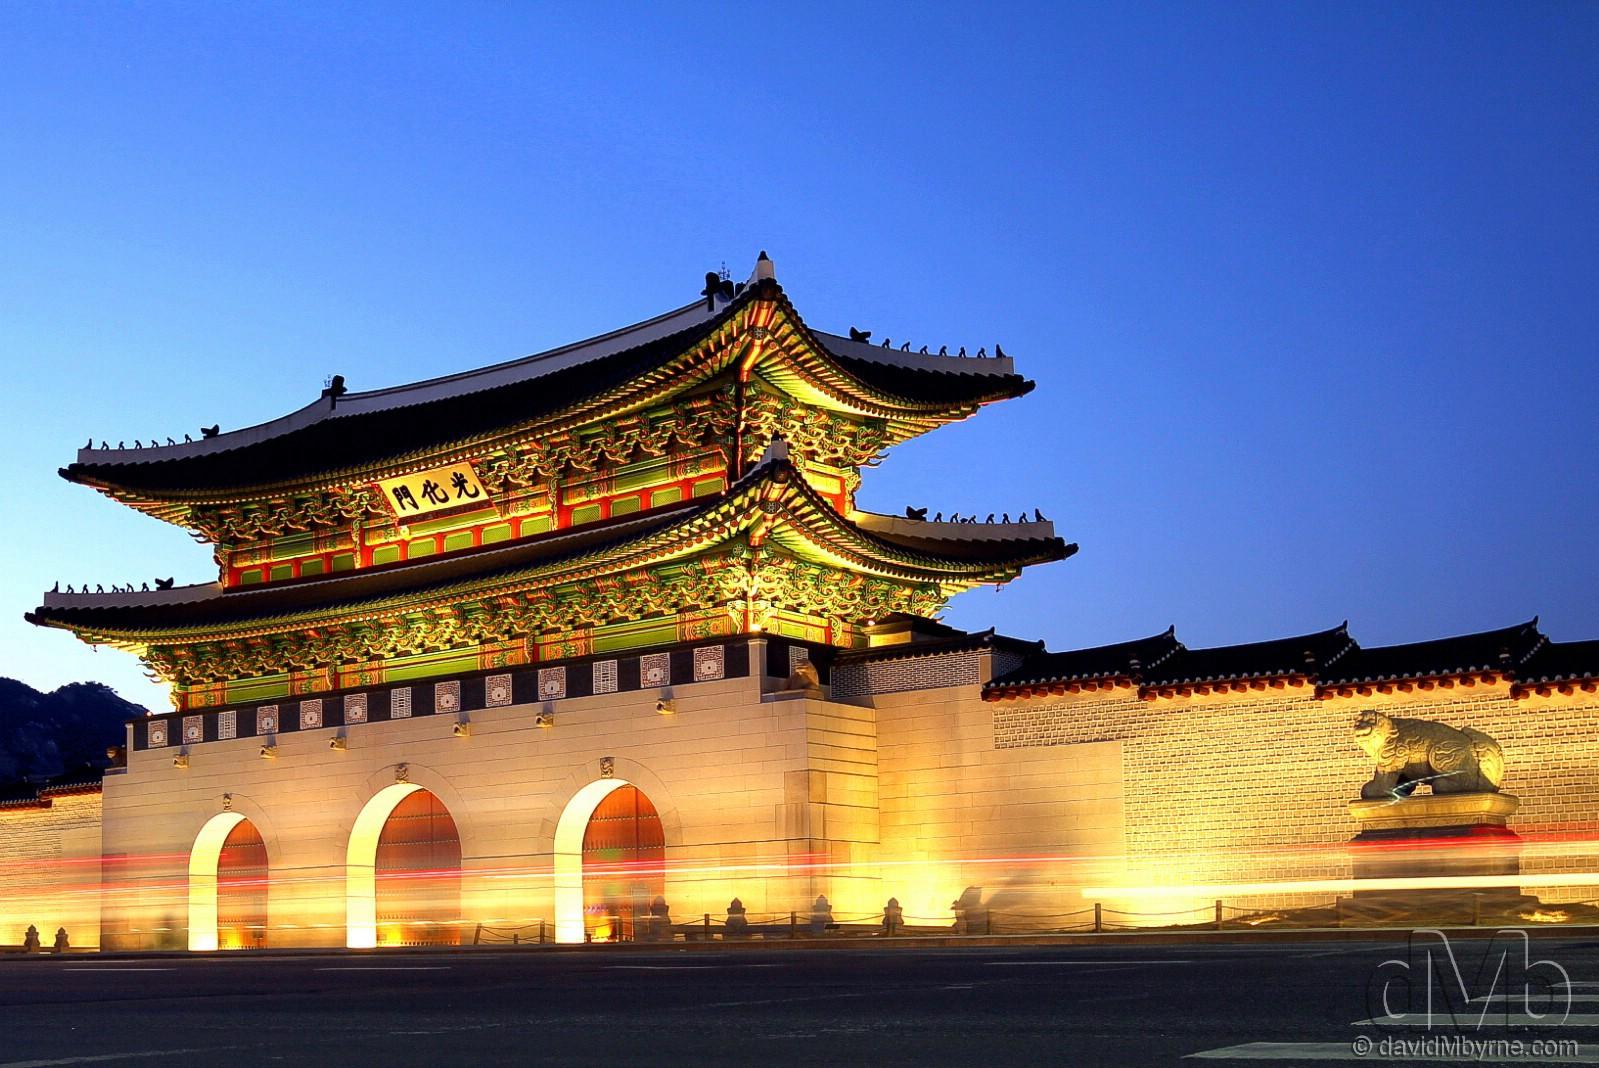 Gwanghwamun, the main, South Gate of Gyeongbok Palace at dusk. Seoul, South Korea. February 7th, 2012 (EOS 60D || Sigma 10-20mm || 20mm, 1.6sec, f/7.1, iso100)